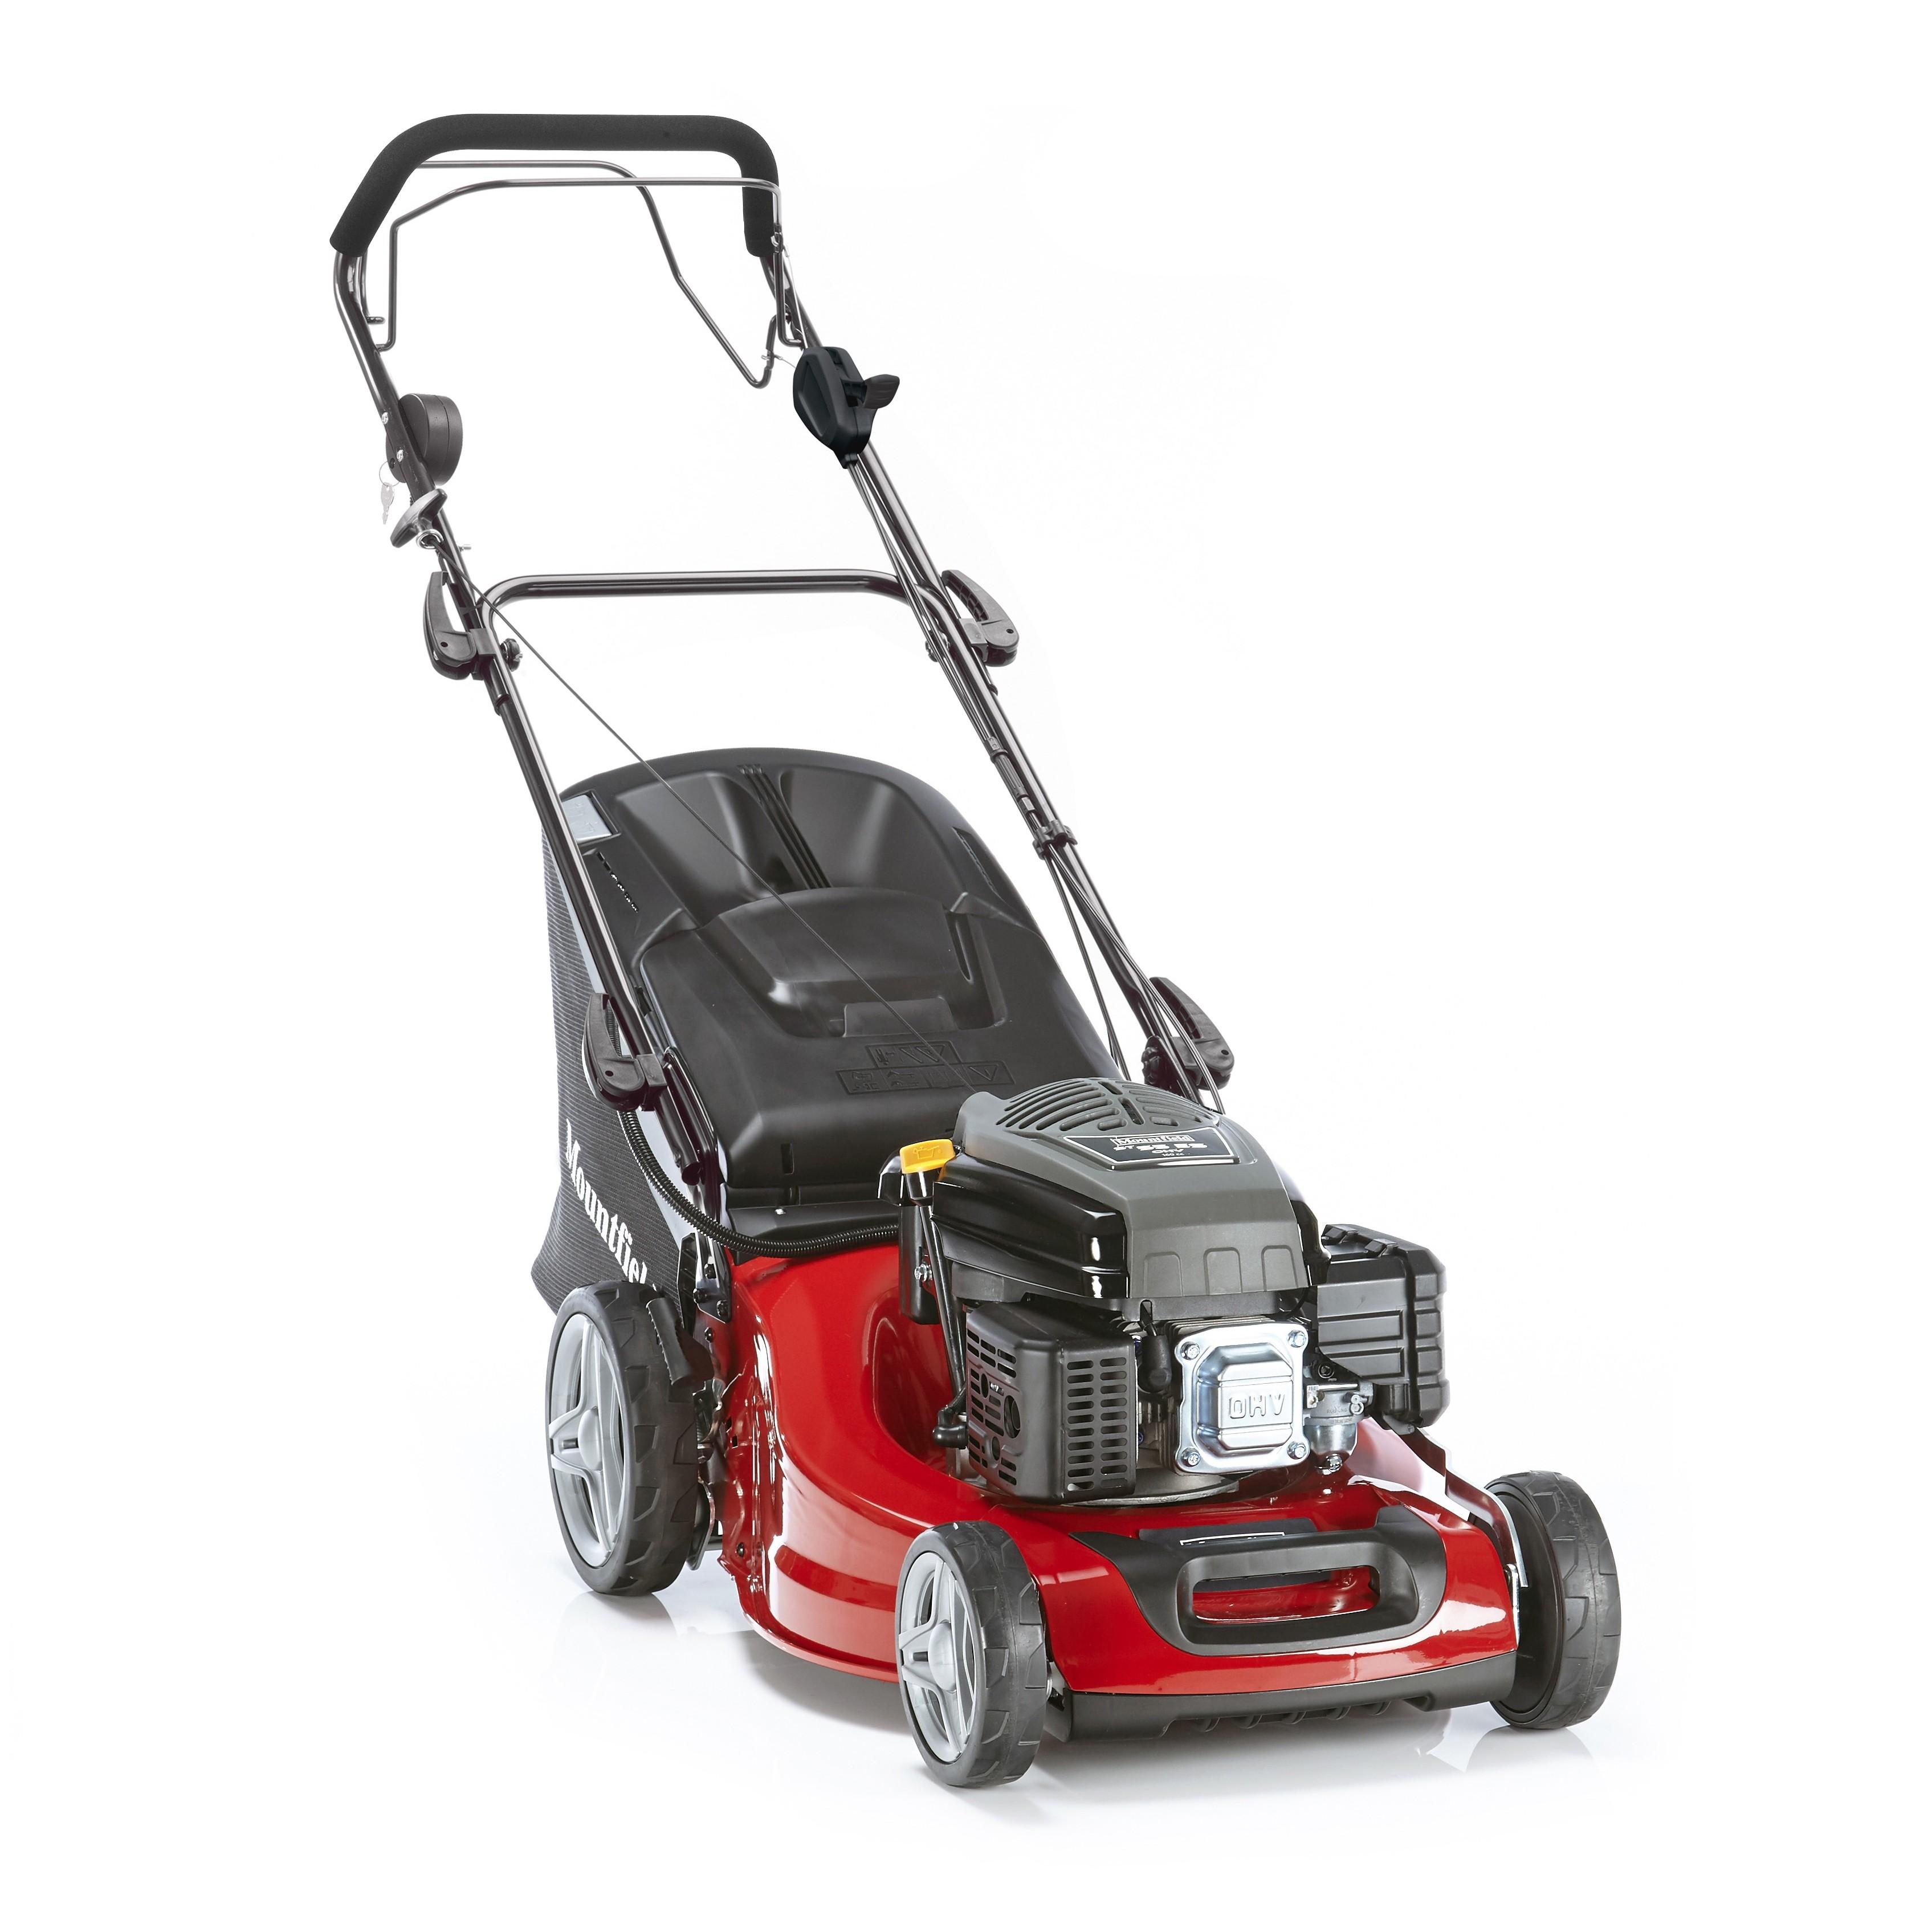 Mountfield S481 PD ES 48cm petrol mower